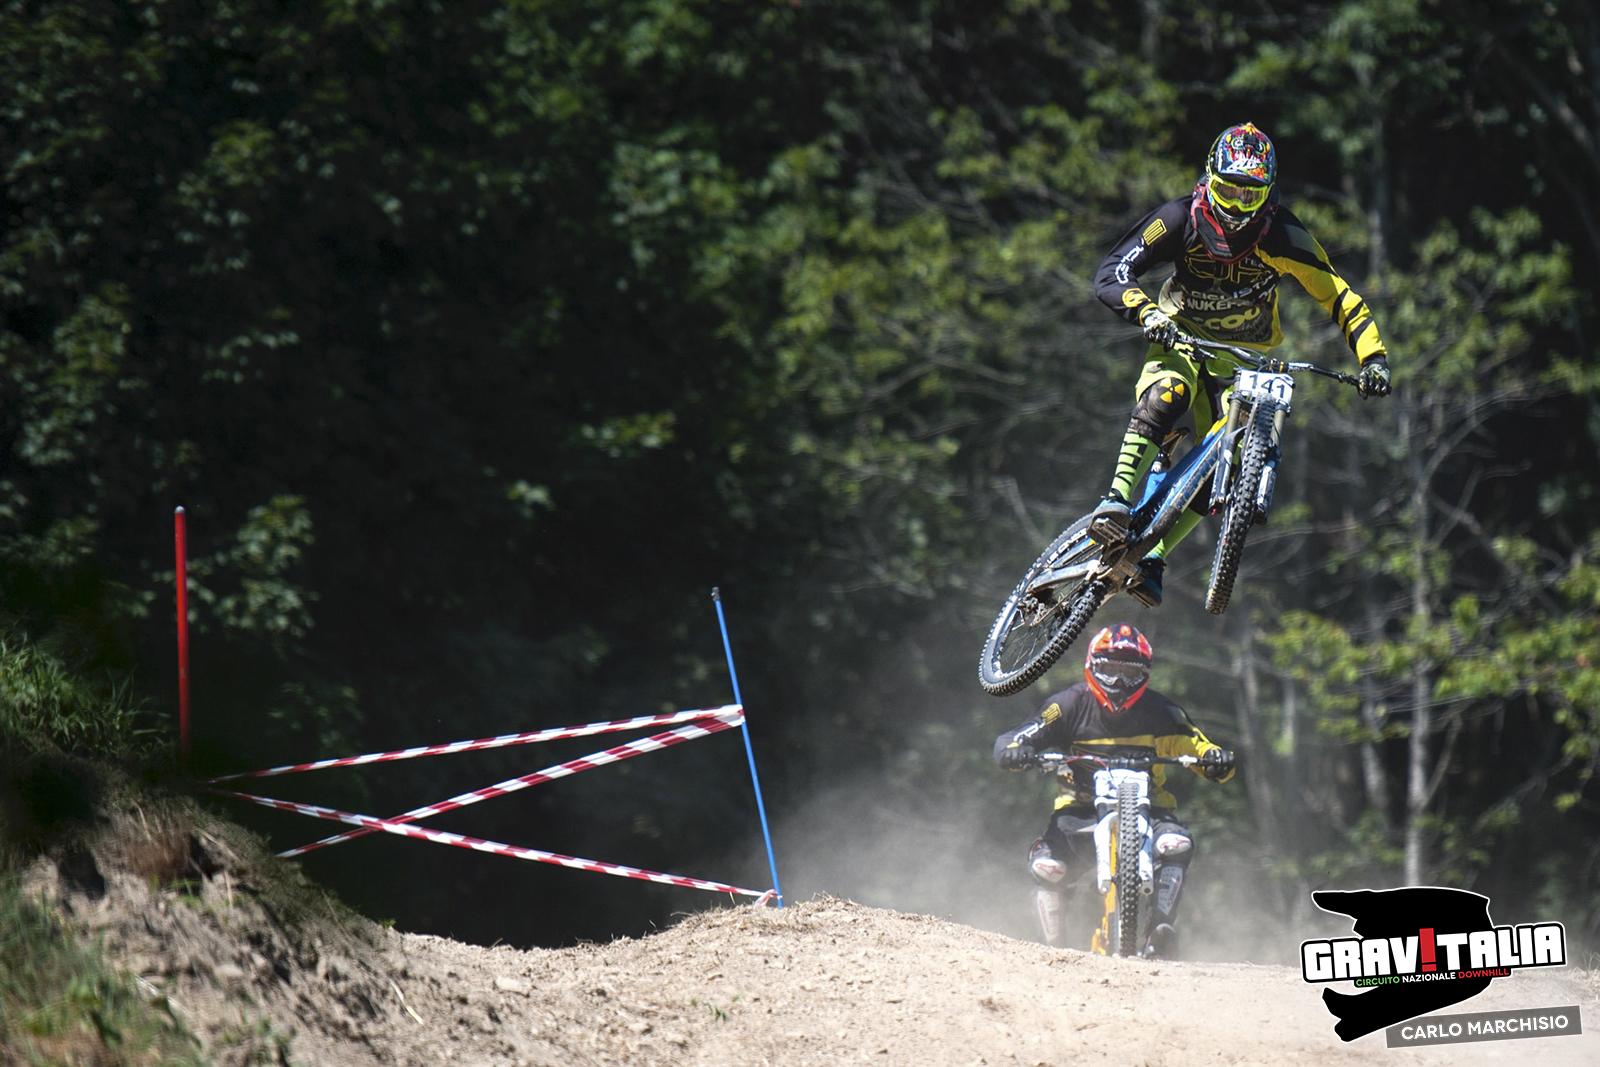 PhotoCarloMarchisio_GIT2015_CampionatiItaliani_Sestola_082